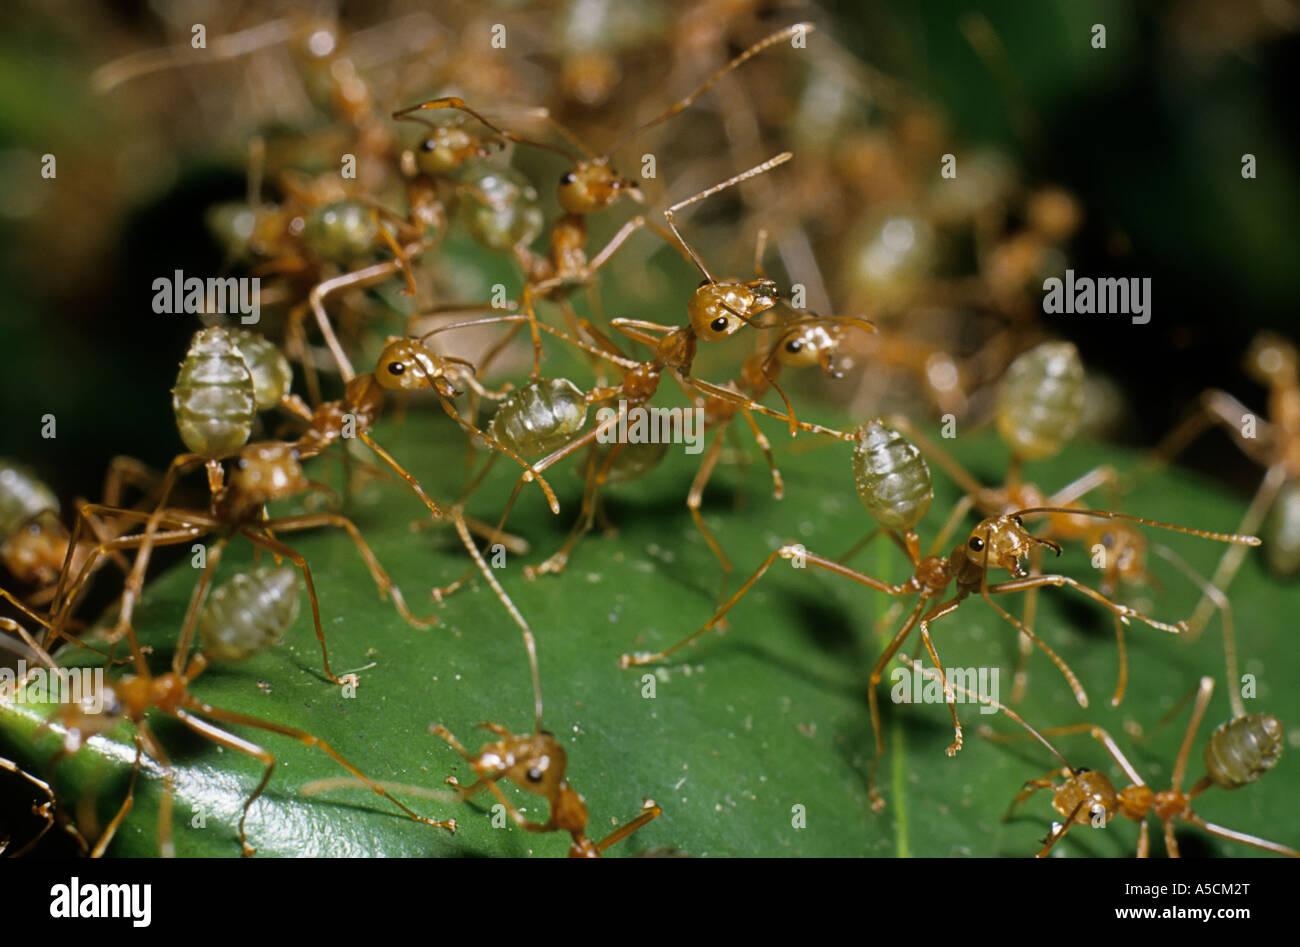 green ants australia stockfotos green ants australia bilder alamy. Black Bedroom Furniture Sets. Home Design Ideas